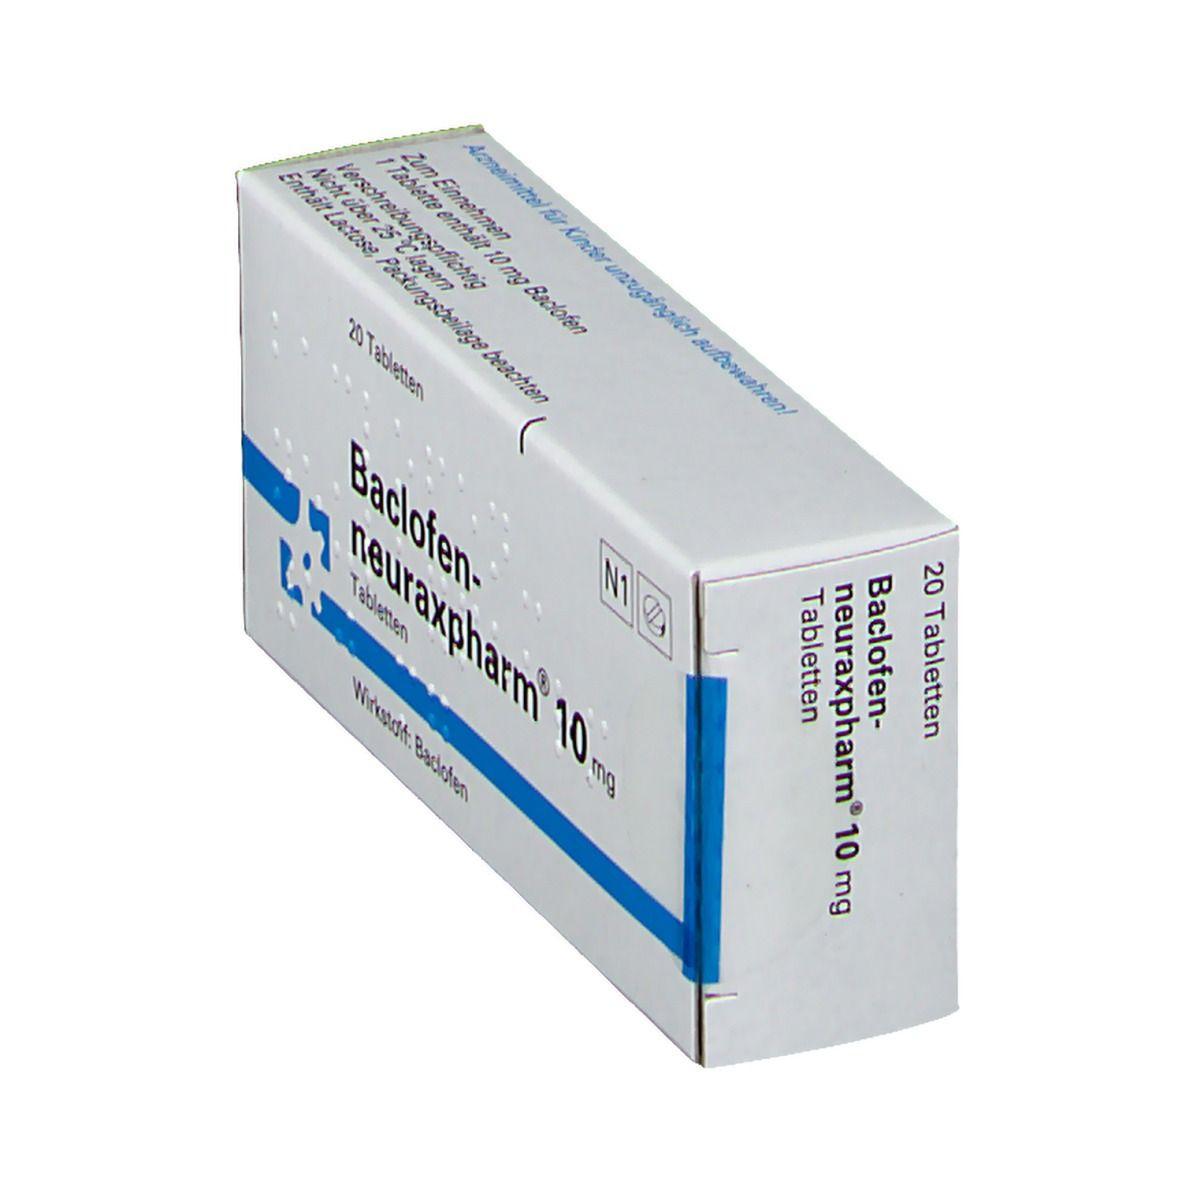 BACLOFEN neuraxpharm 10 mg Tabletten